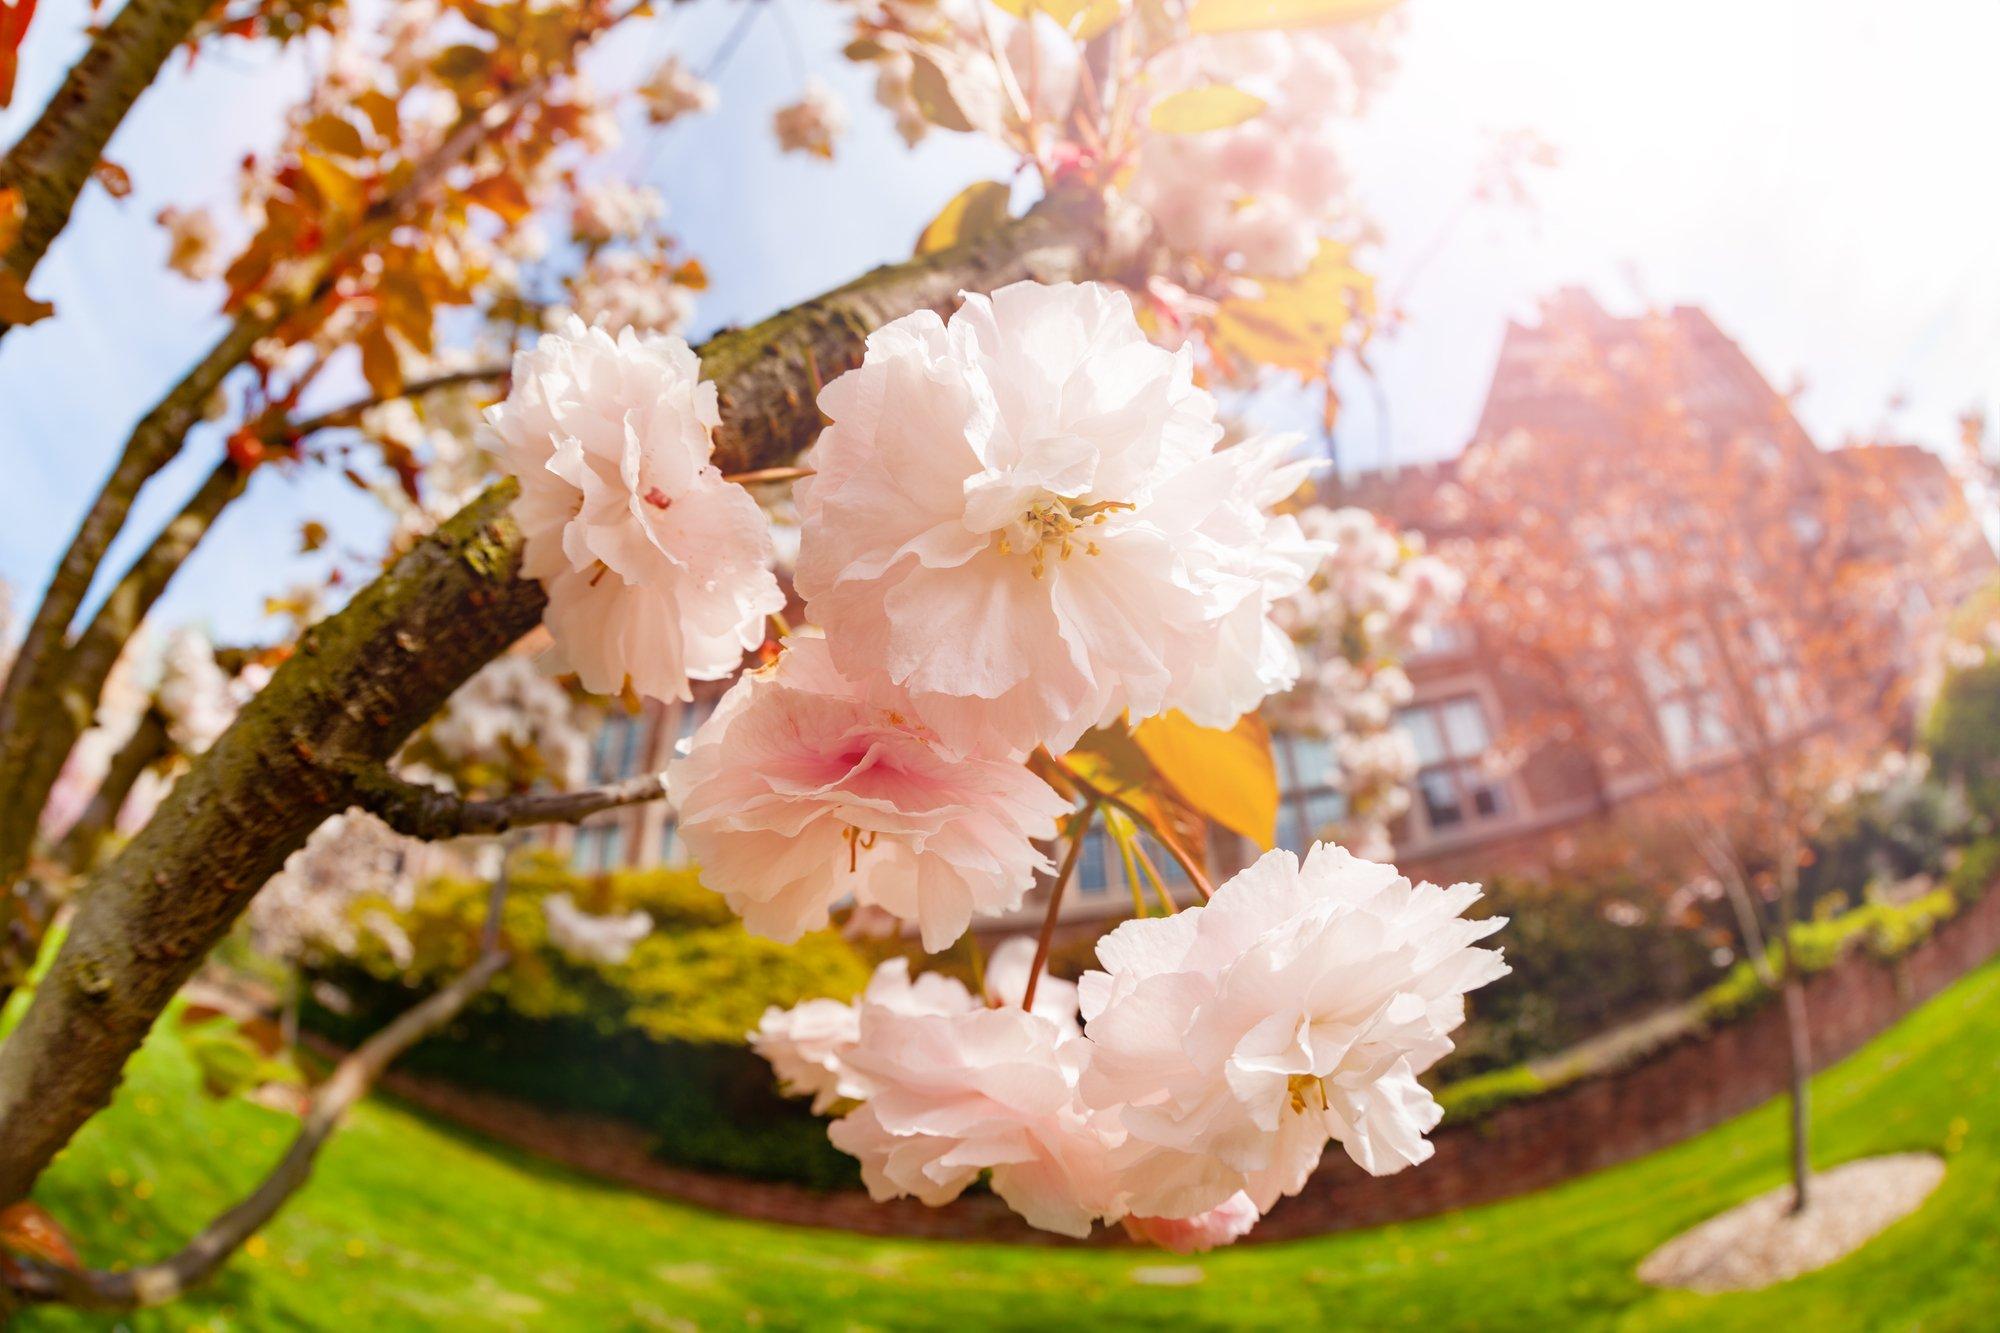 Japanese cherry, Prunus or Cerasus serrulata blossoms in Seattle University campus, Washington